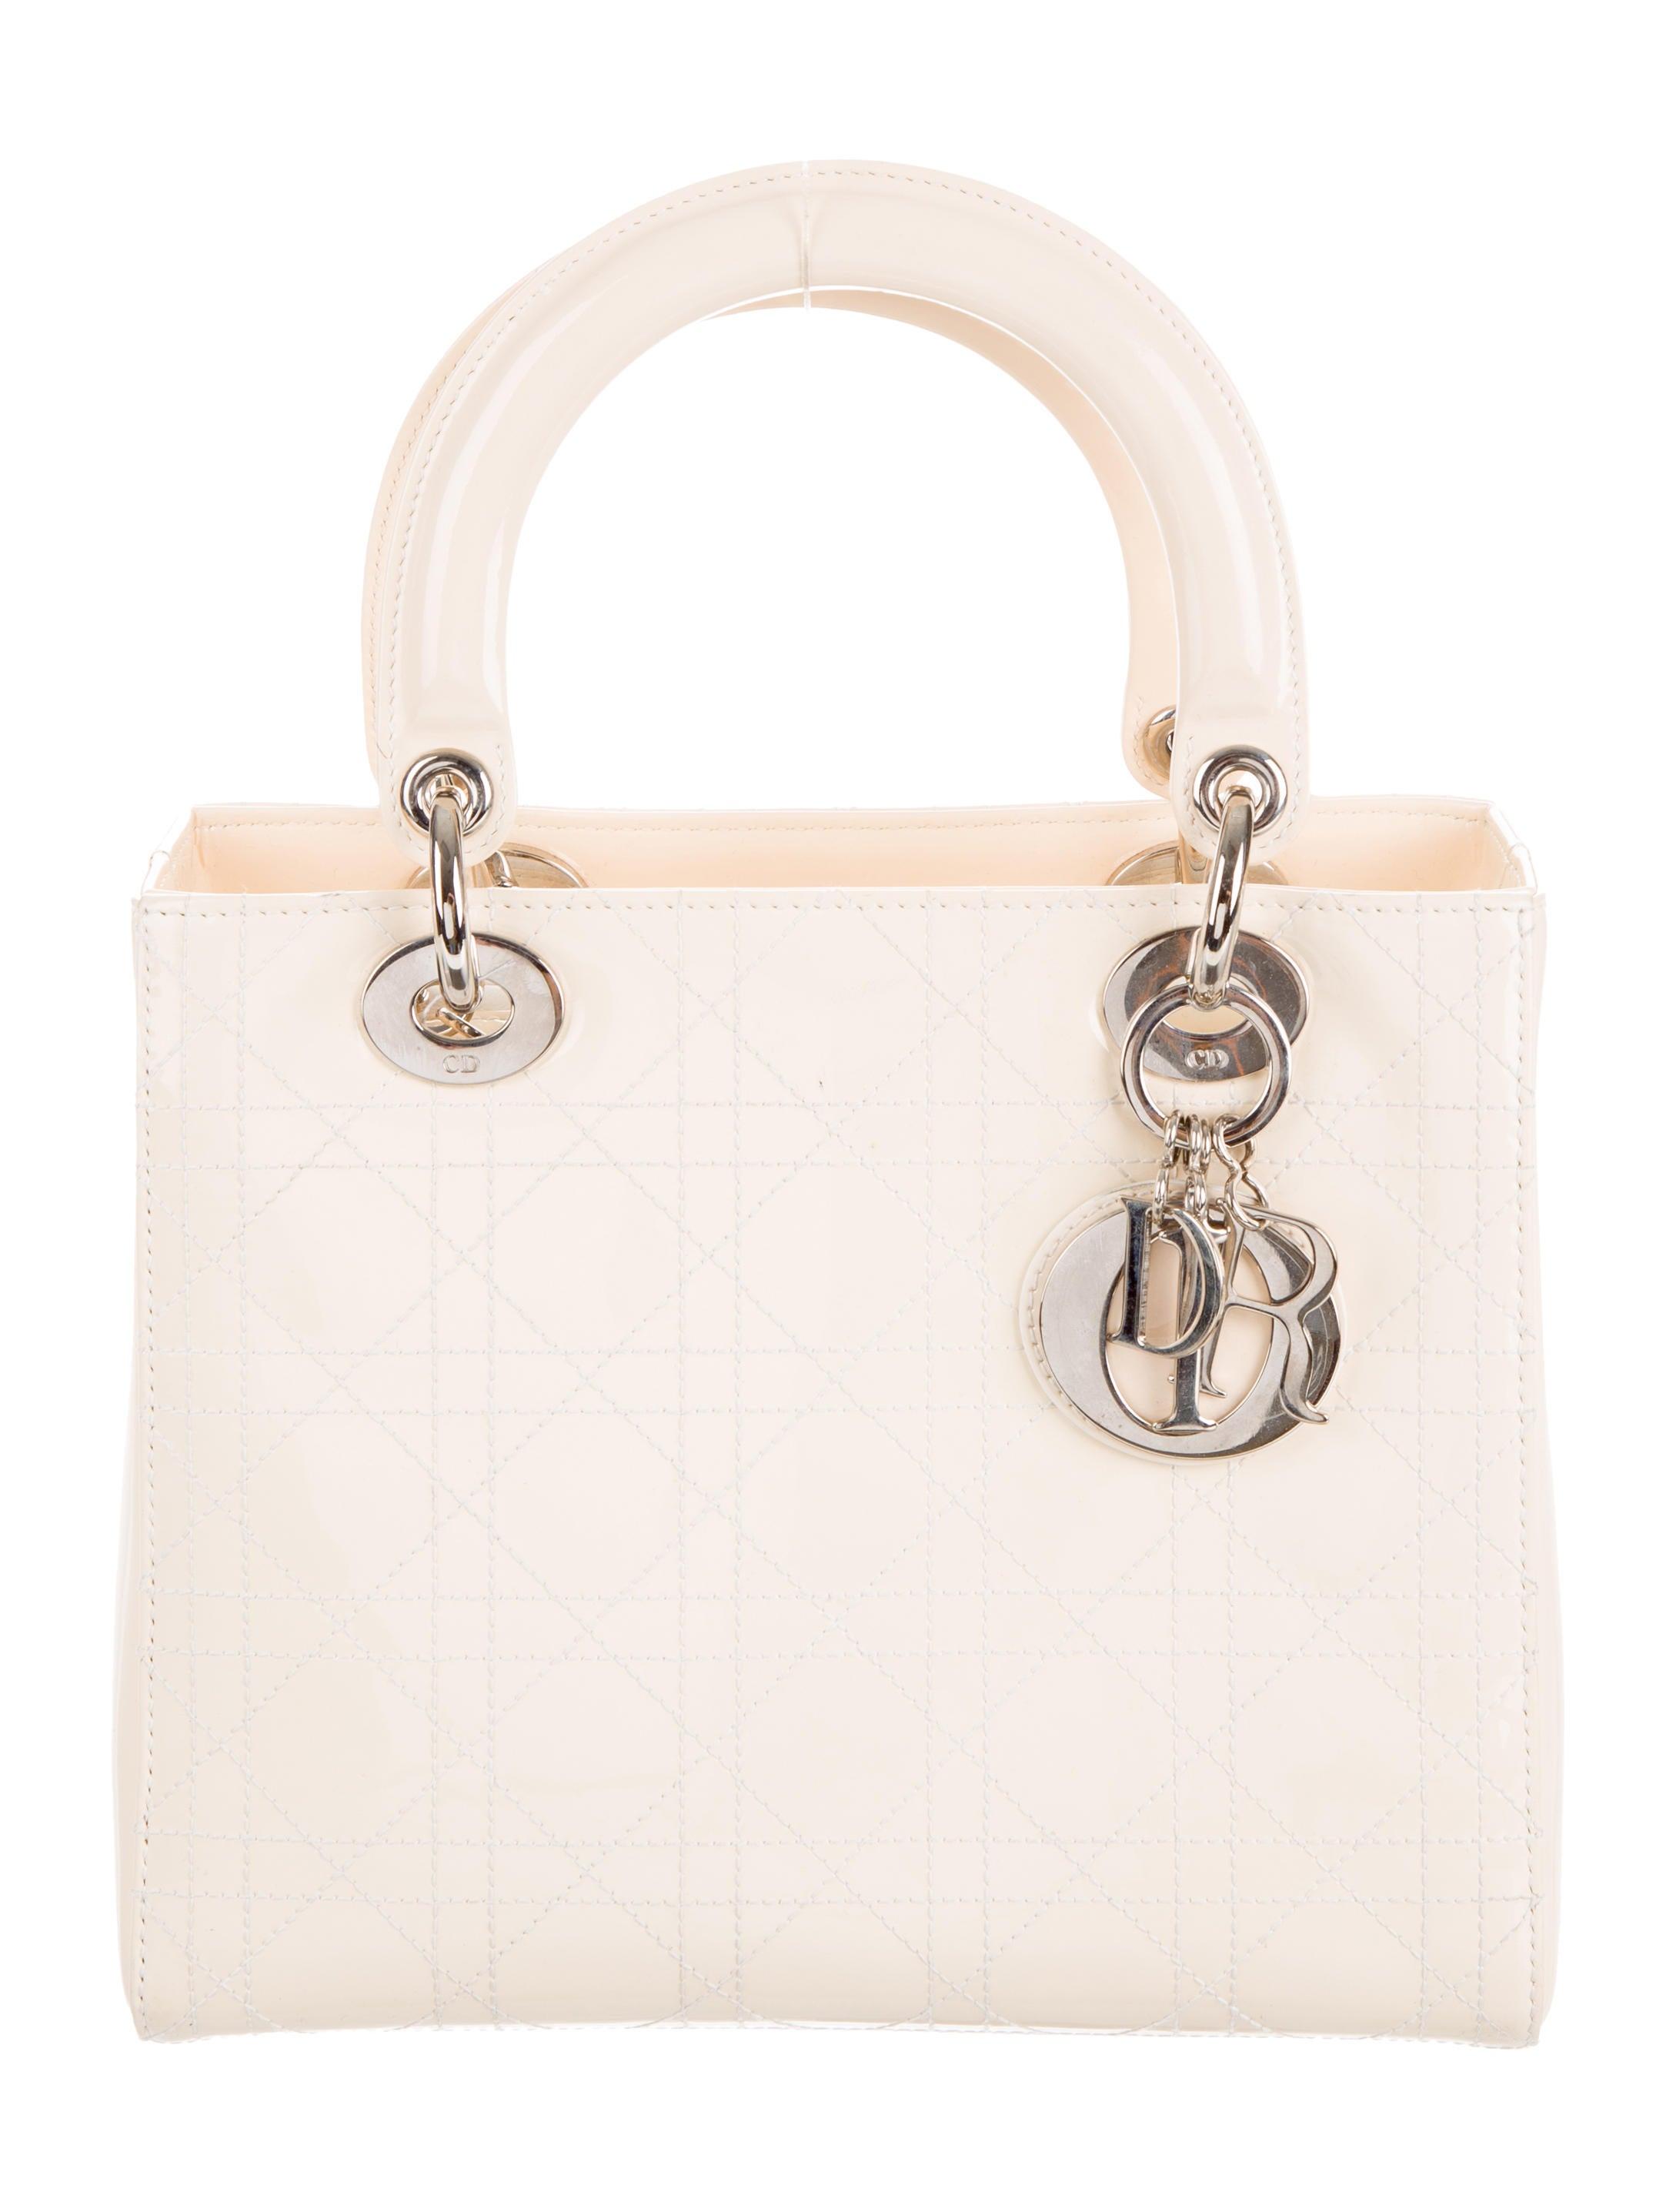 christian dior medium lady dior handbags chr57322 the realreal. Black Bedroom Furniture Sets. Home Design Ideas